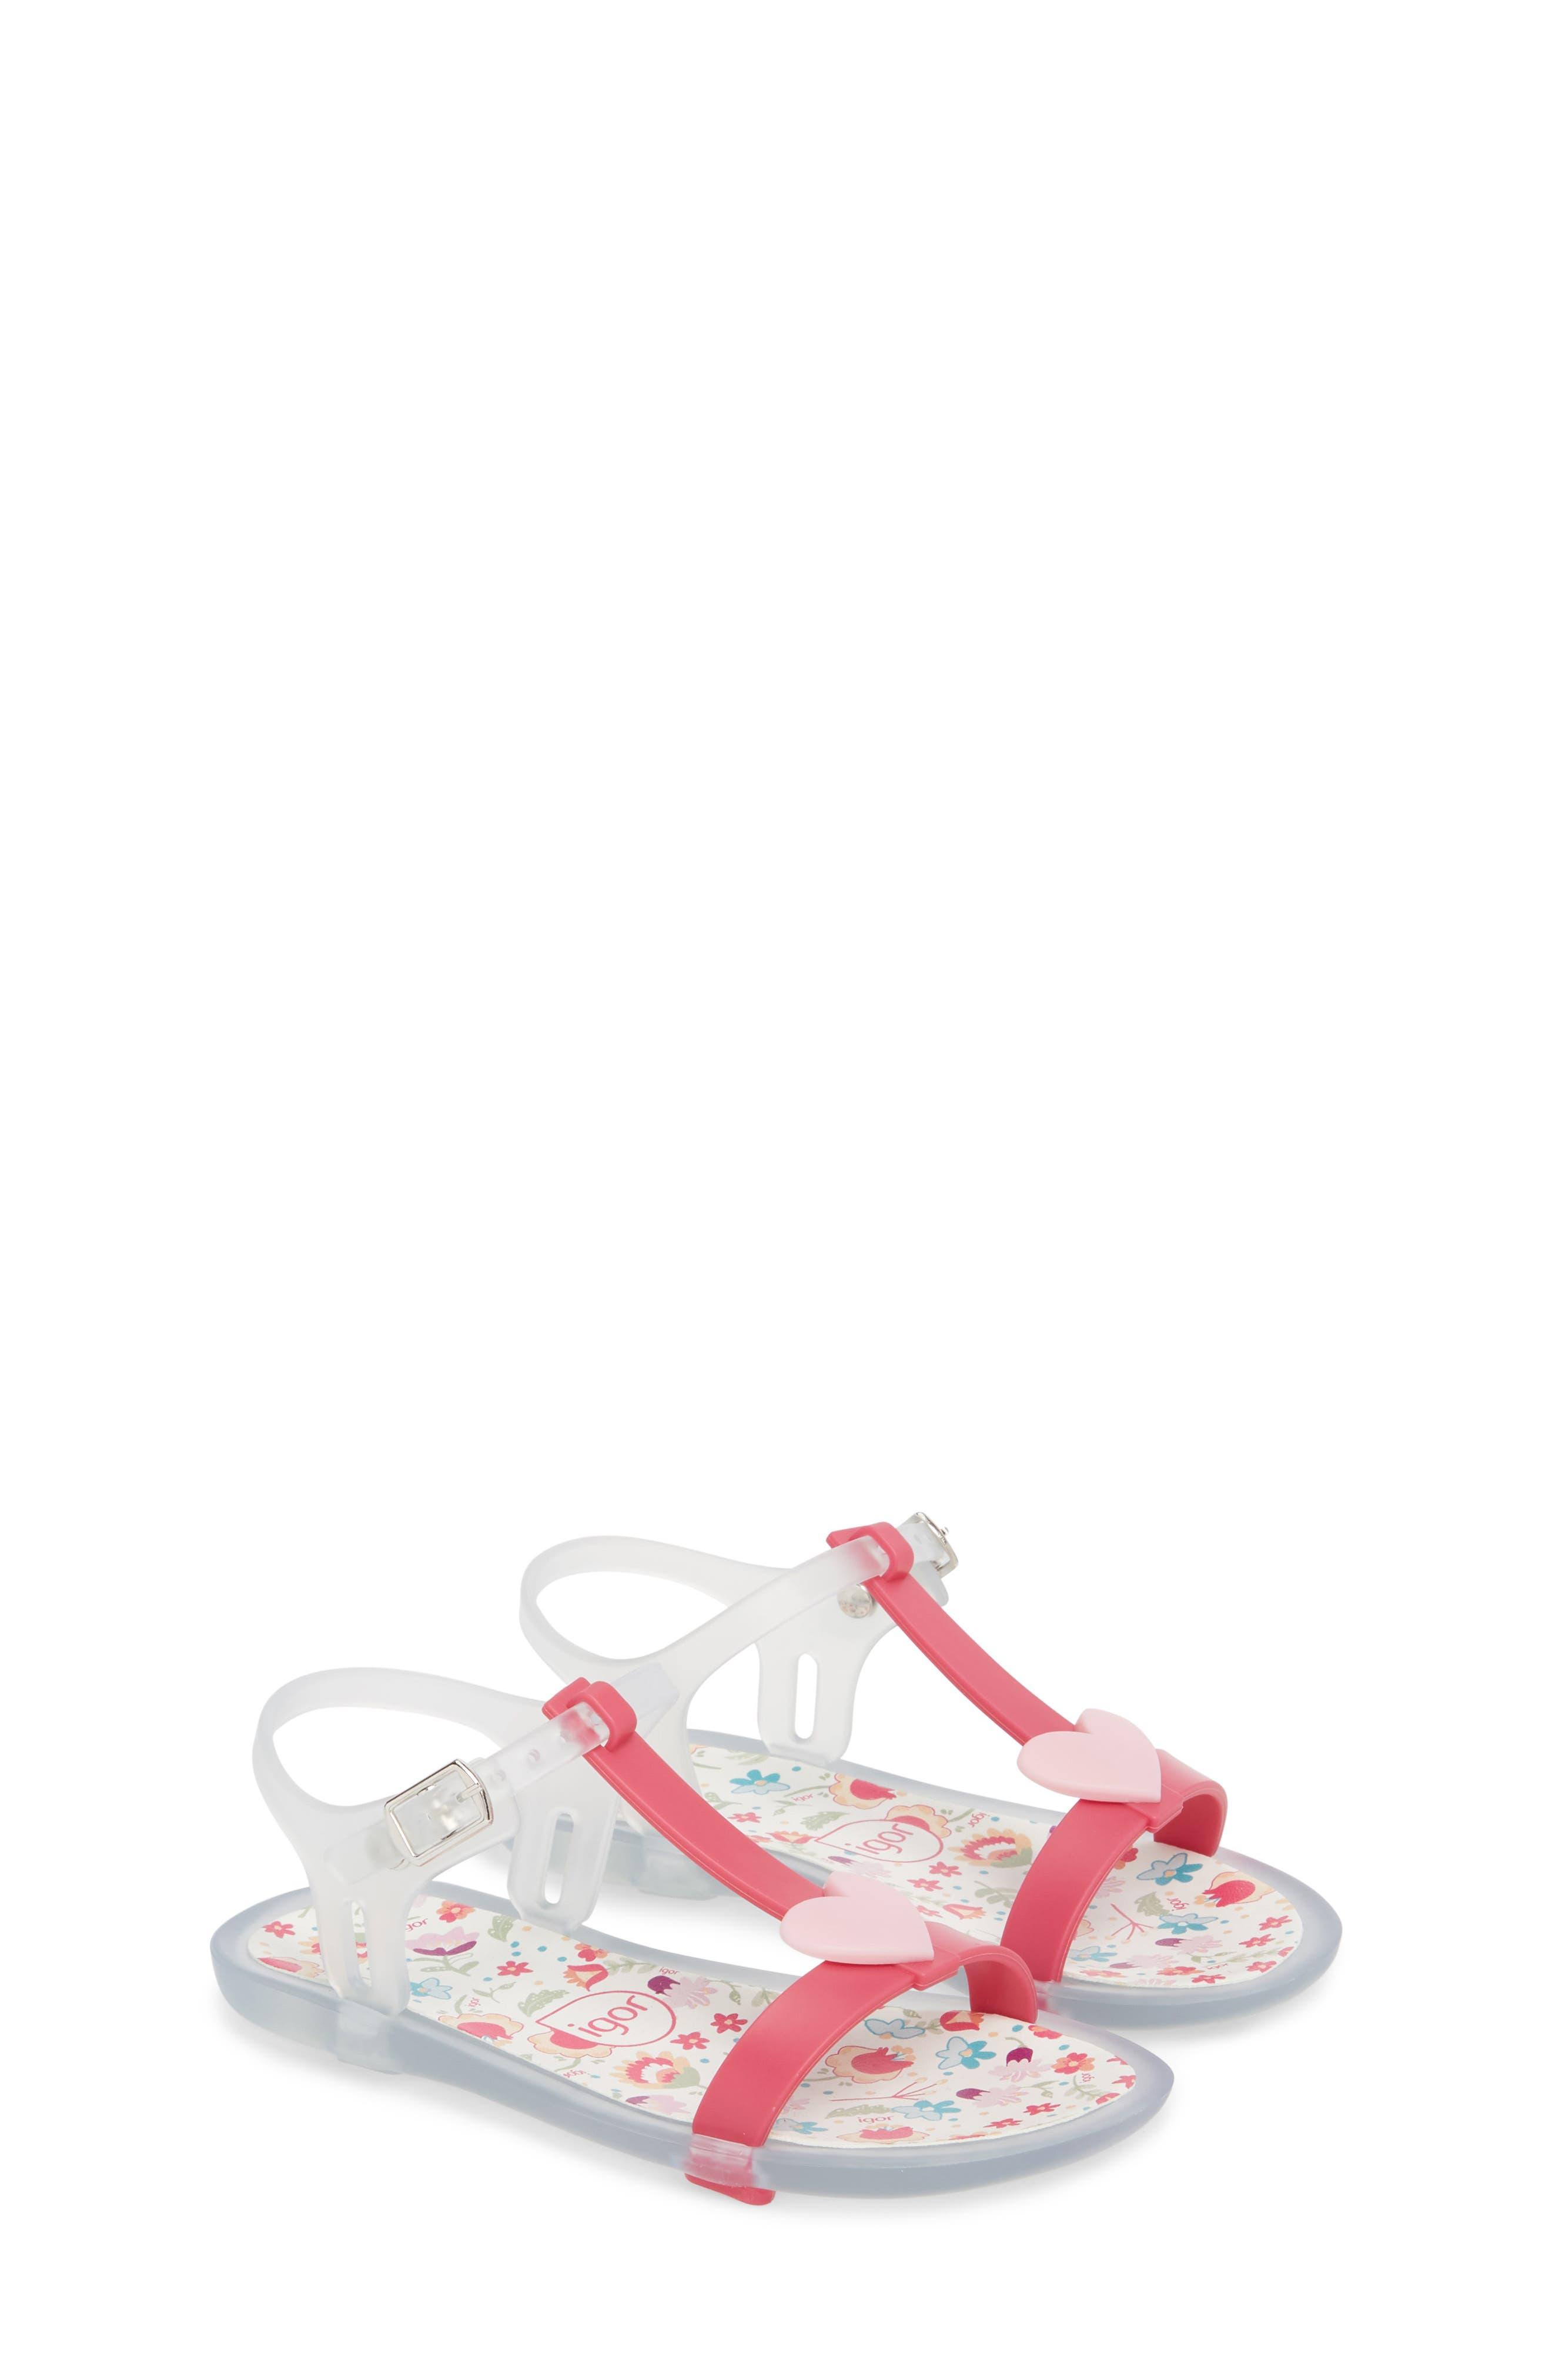 Tricia Cuore T-Strap Sandal,                             Main thumbnail 1, color,                             Fuchsia